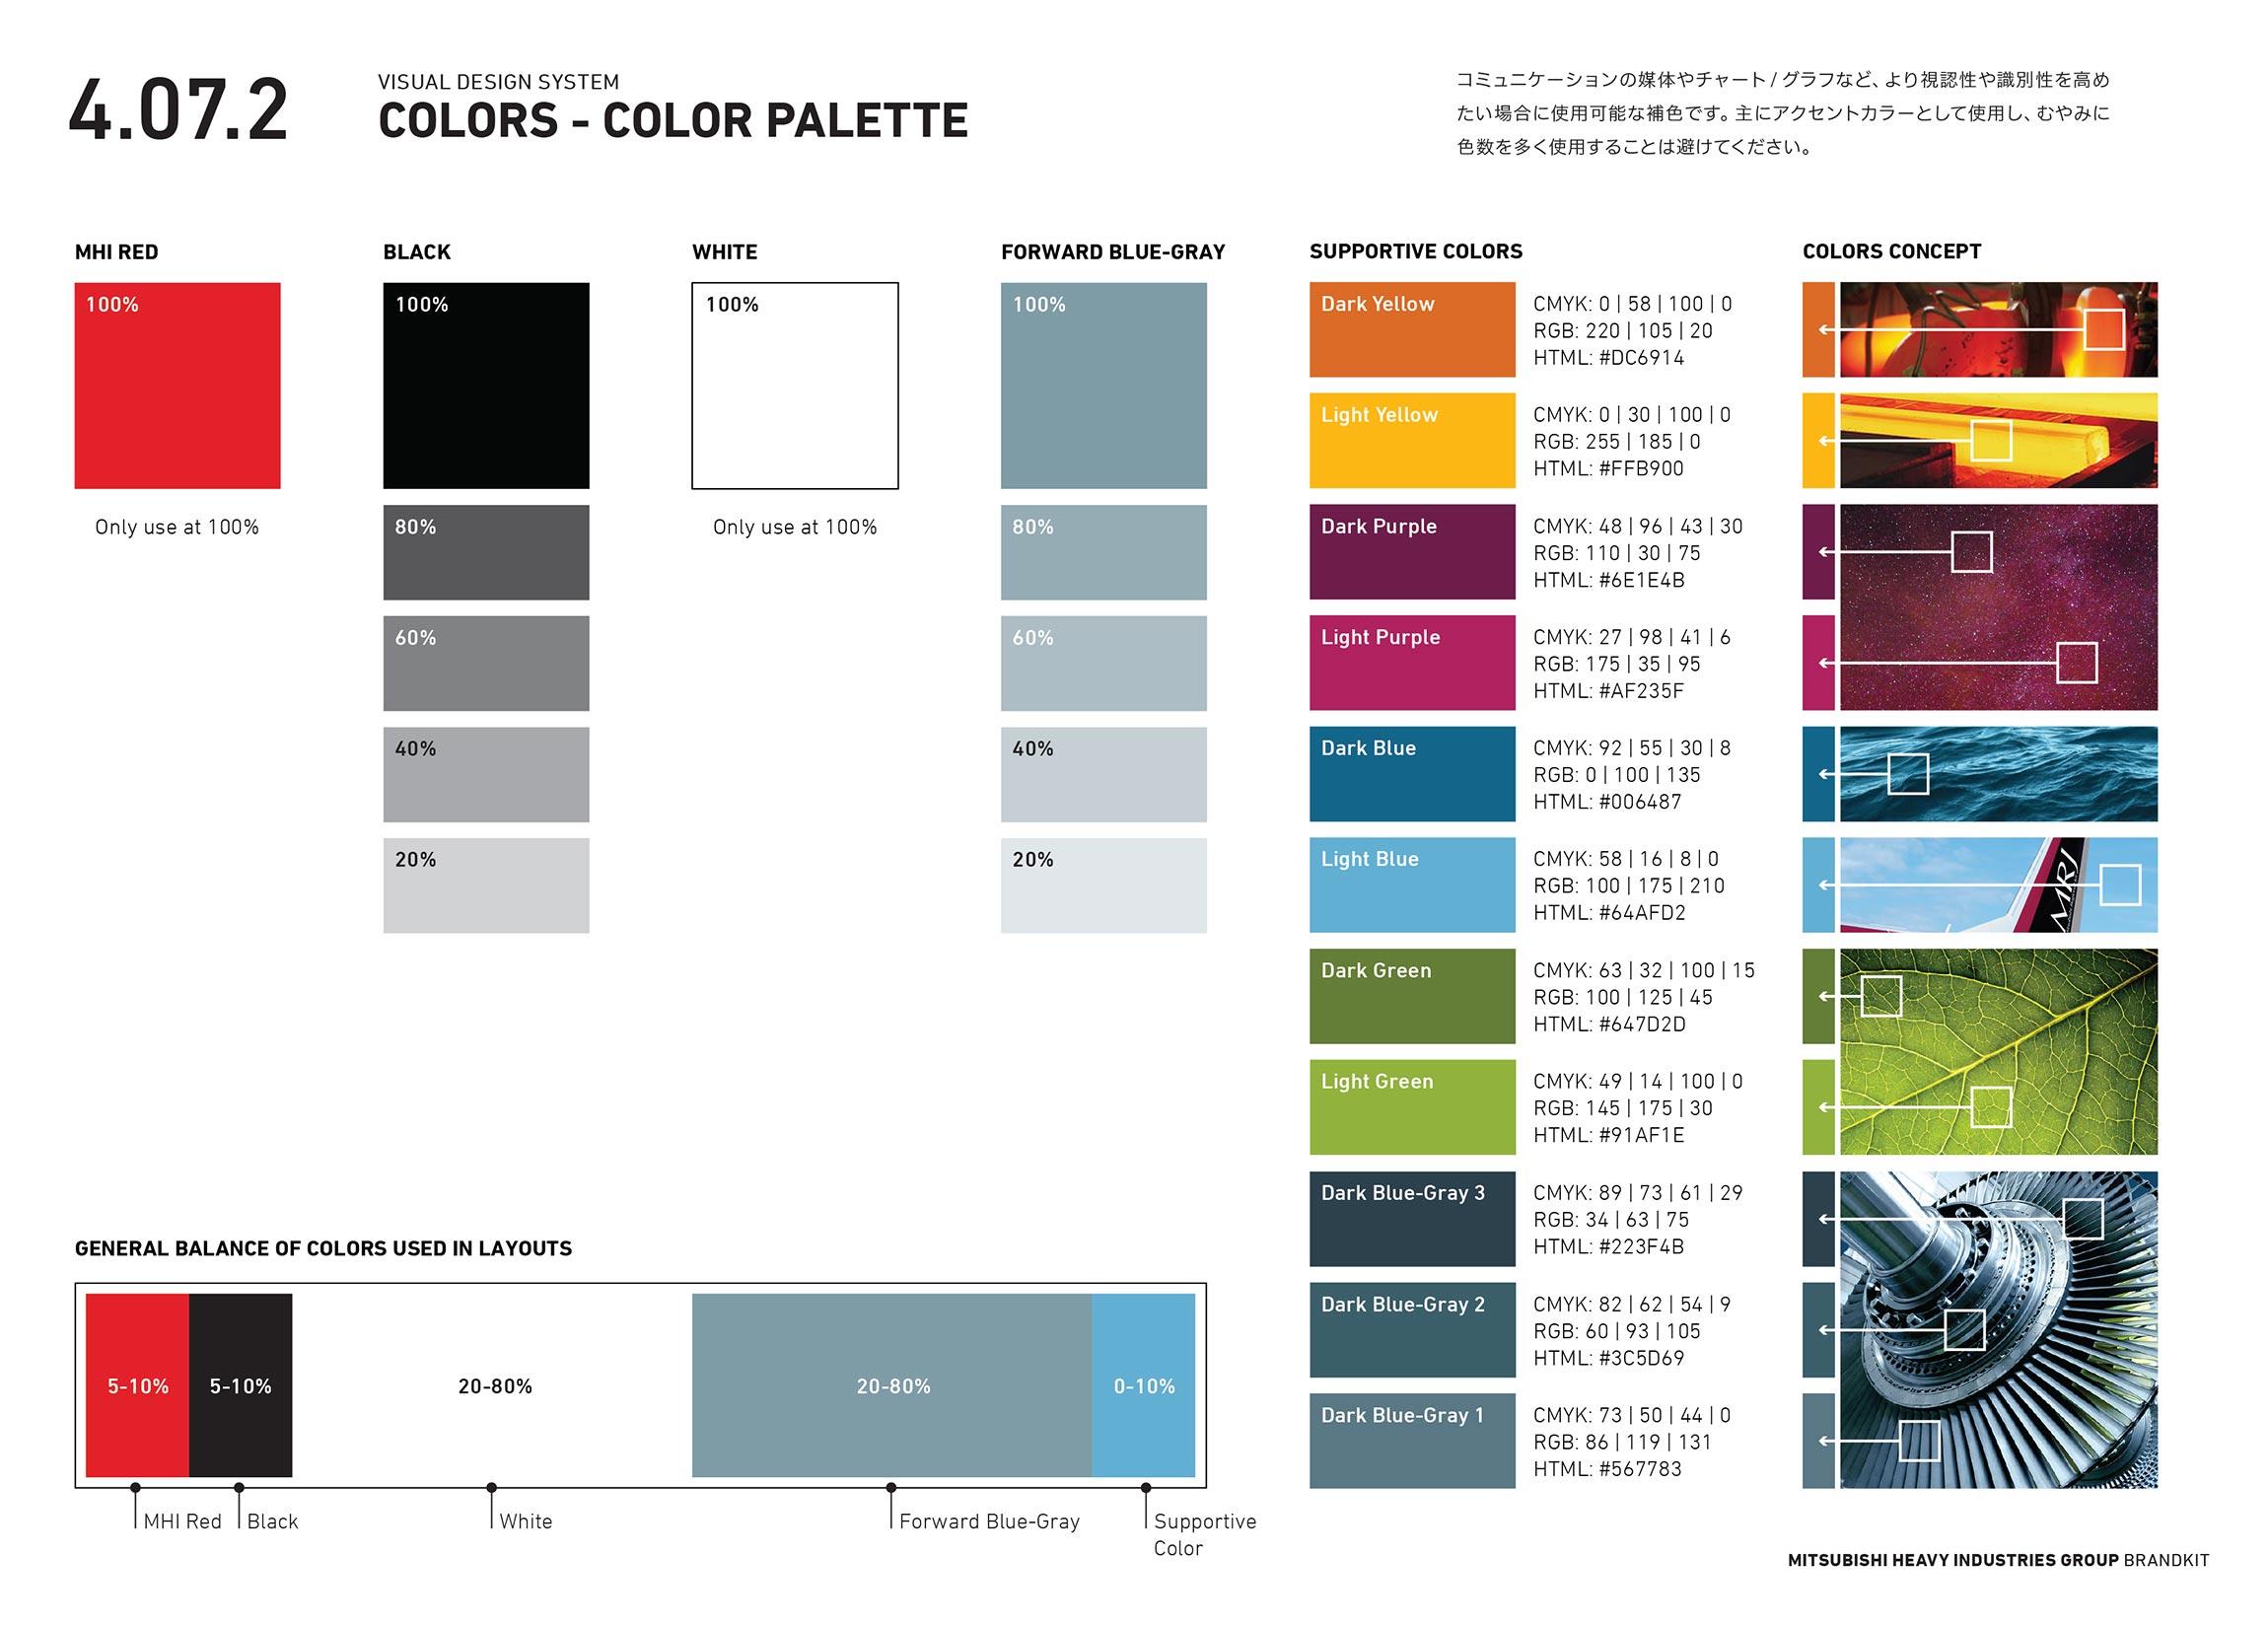 Mitsubishi Group colour palette